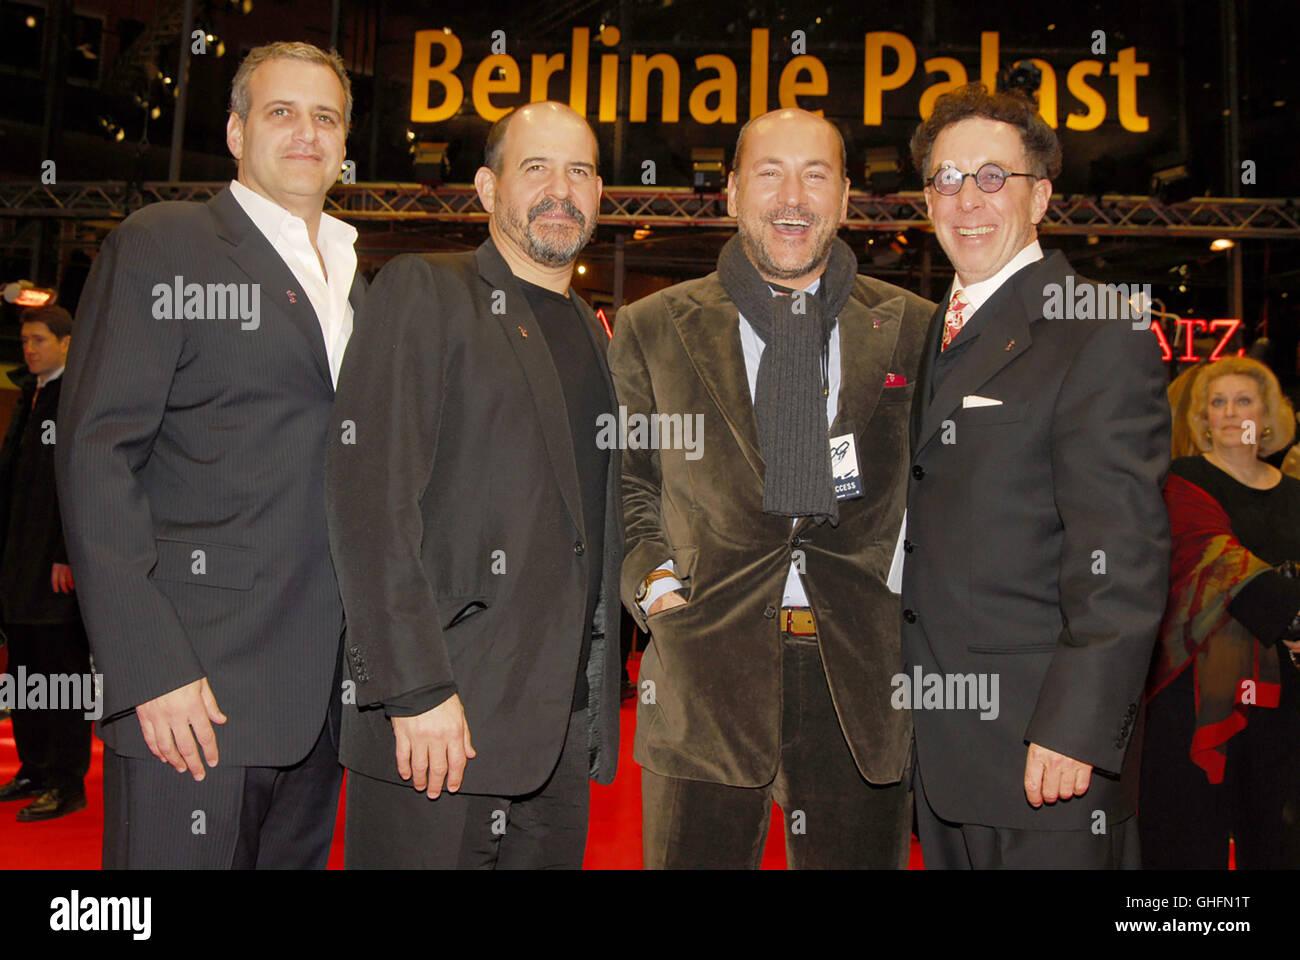 300 300 USA 2006 Zack Snyder 300 / Berlinale 2007 / Weltpremiere des Films 300 / BERNIE GOLDMANN, JEFFREY SILBER, - Stock Image